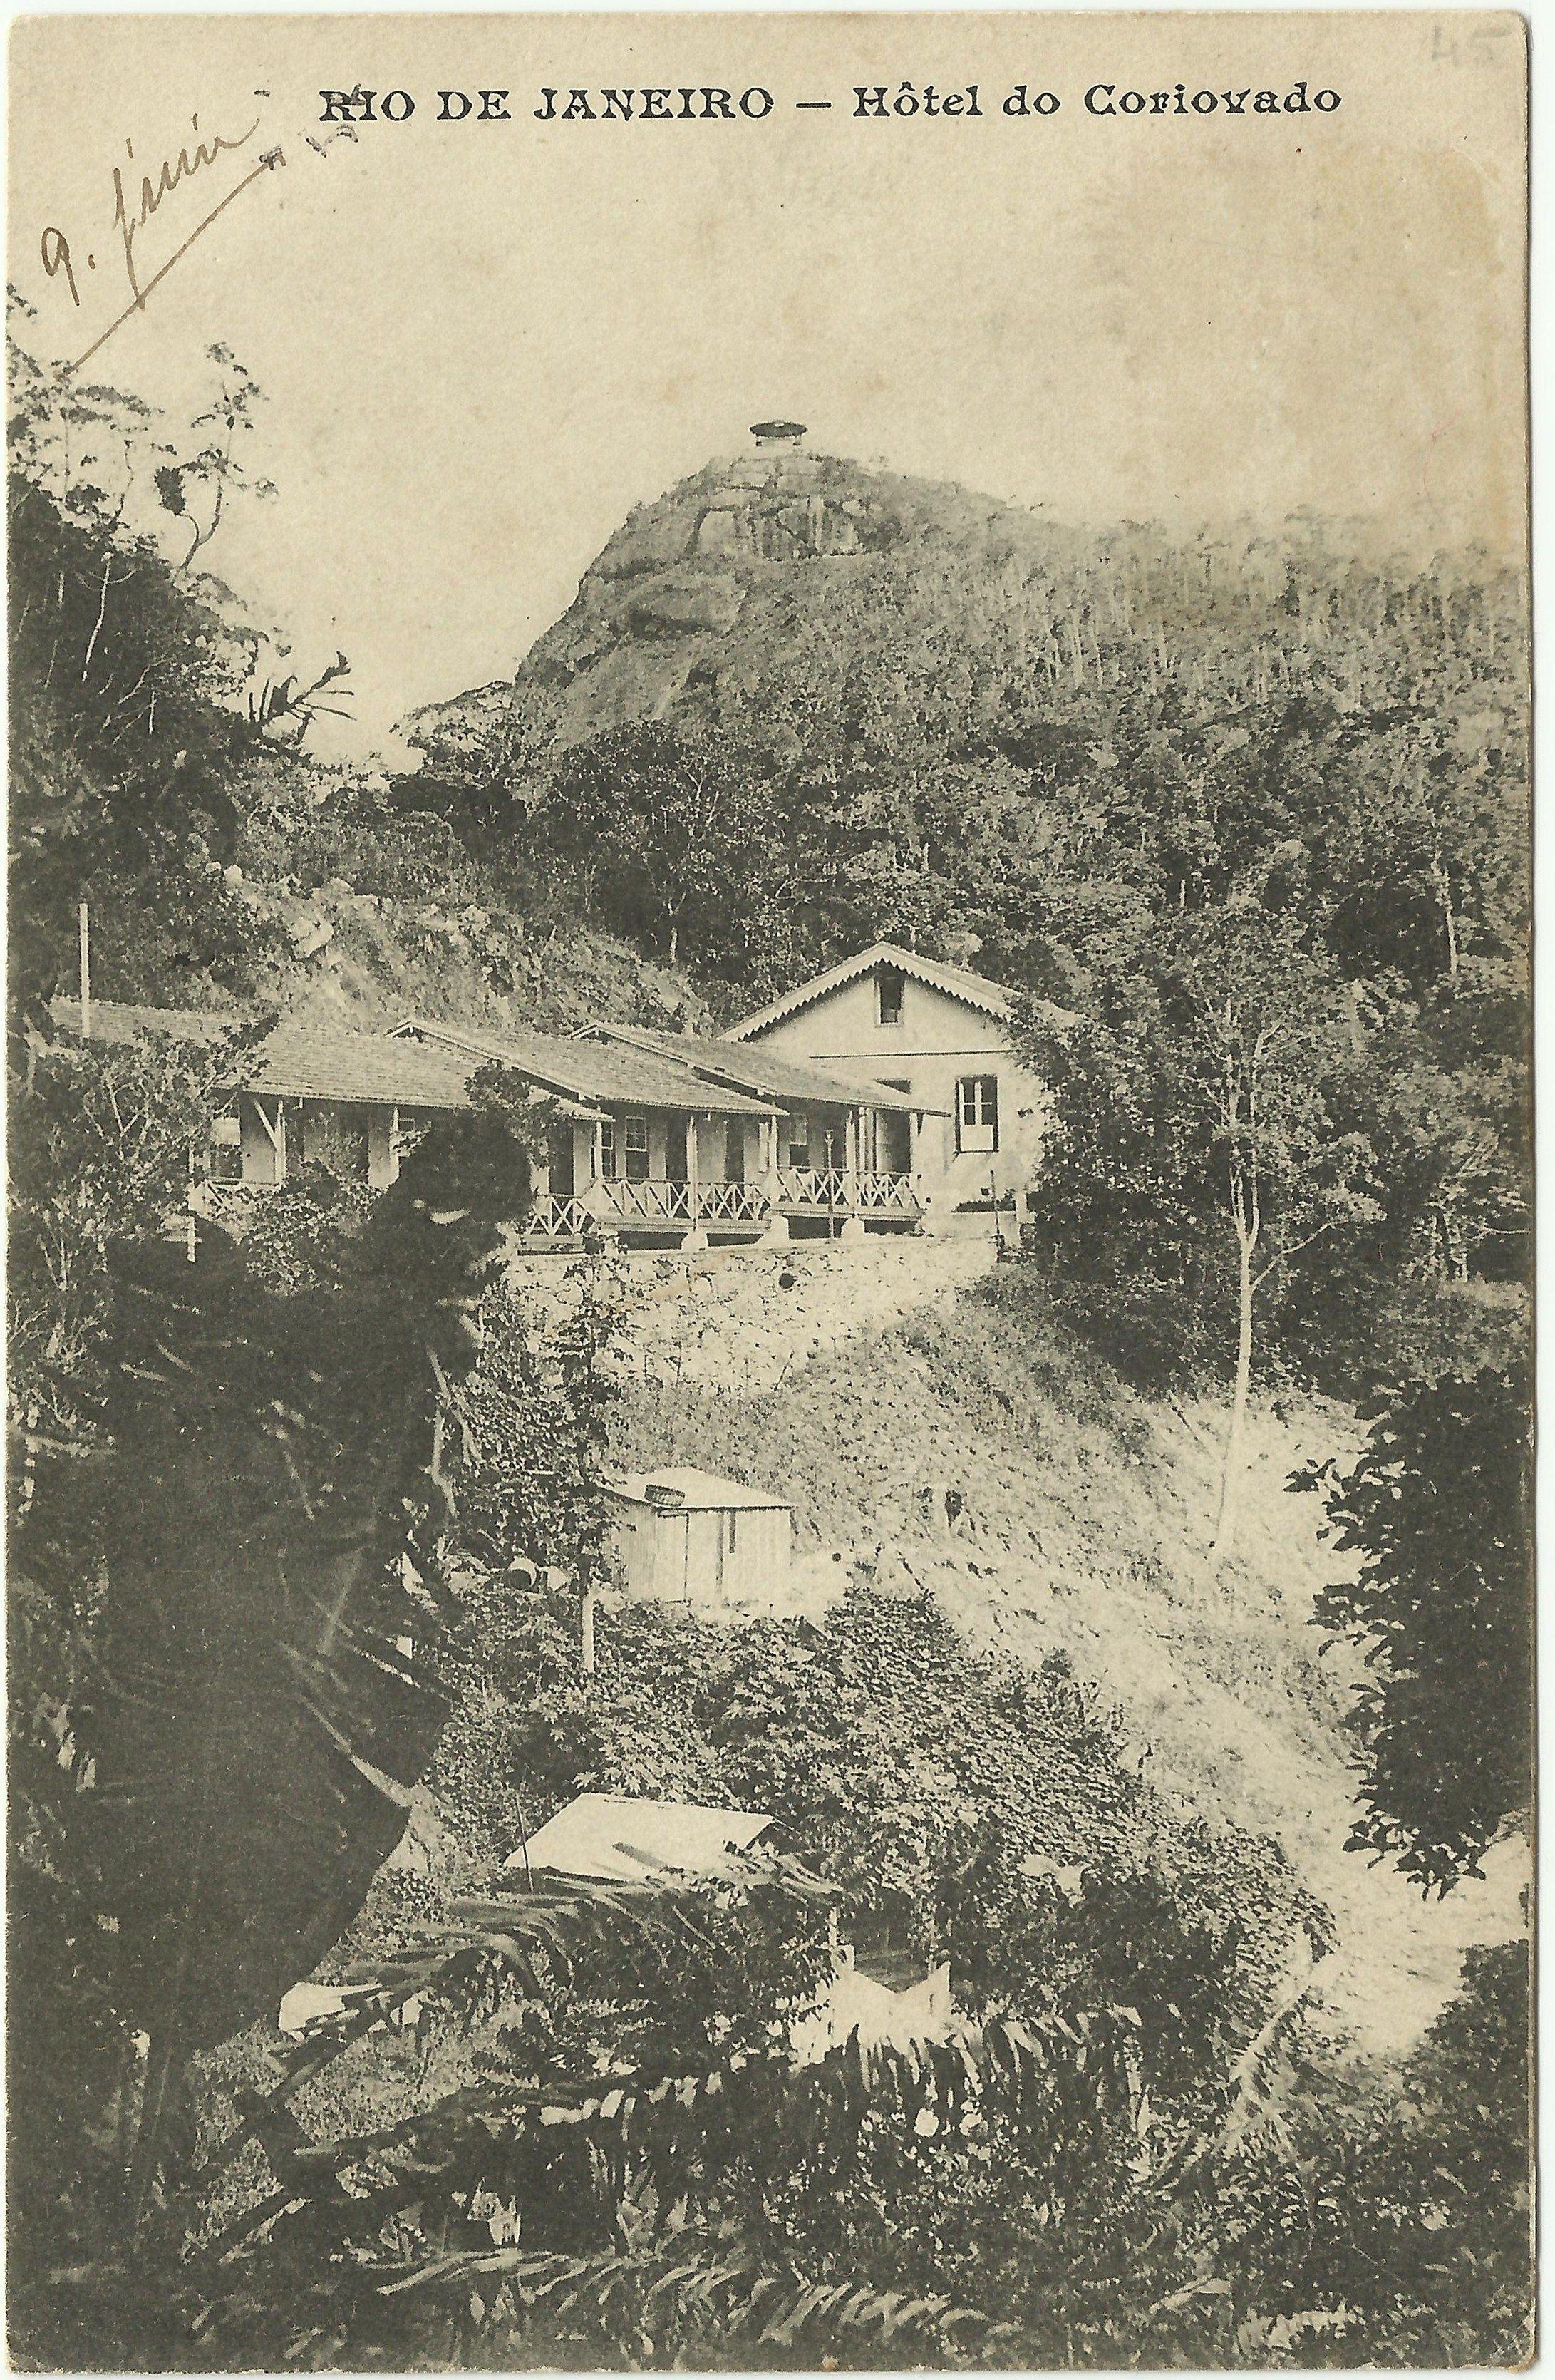 Hotel do Corcovado: Rio de Janeiro, 1907